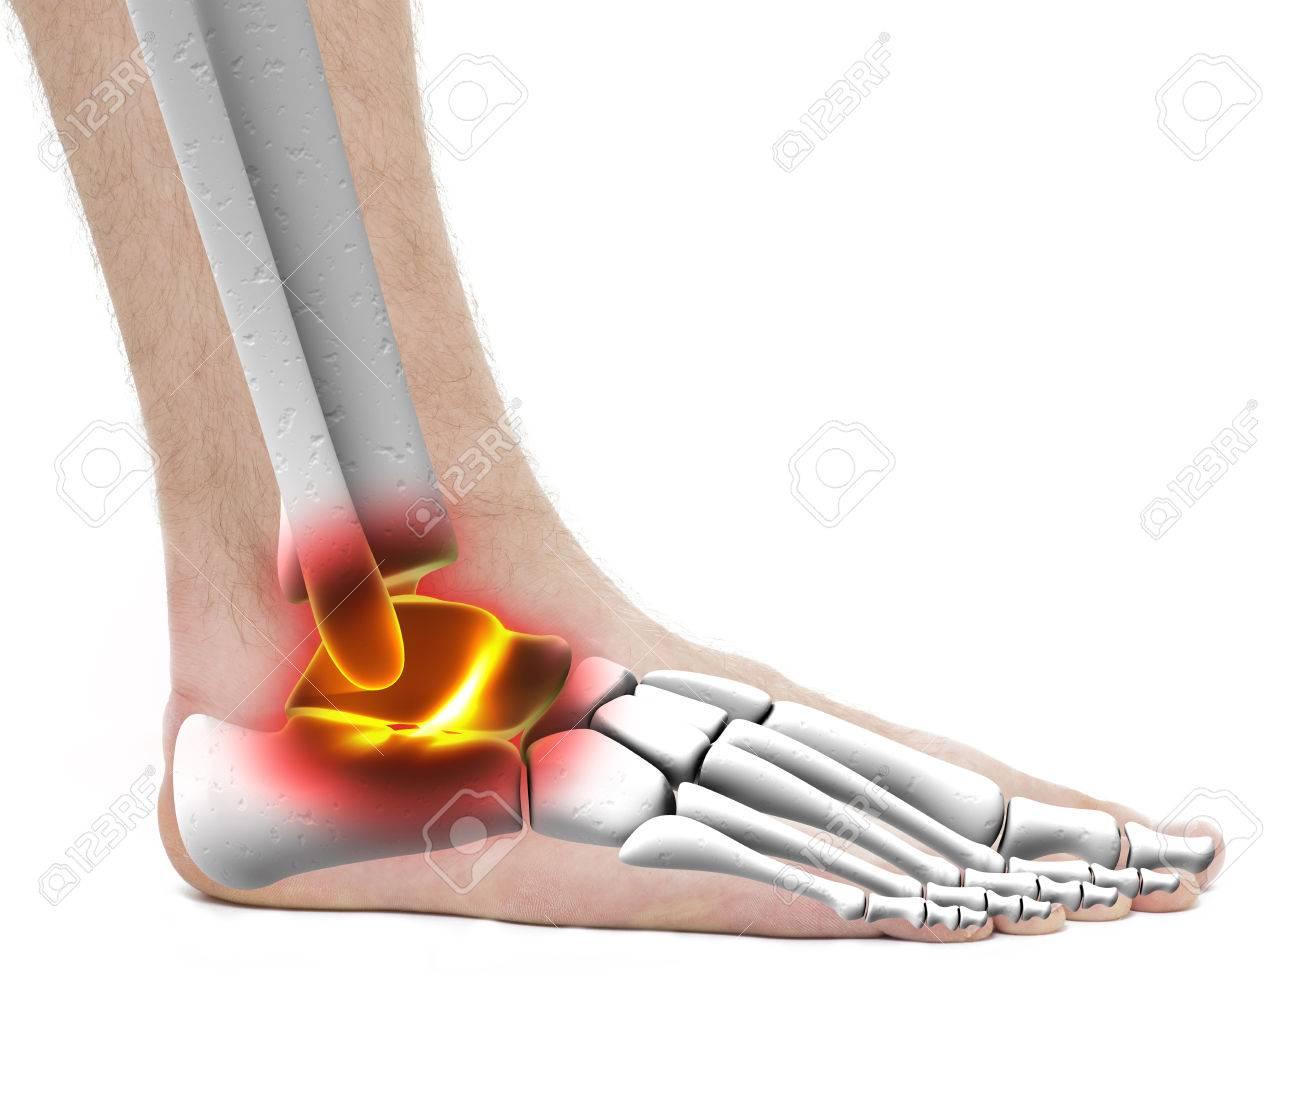 Ankle Pain Injury Anatomy Male Studio Photo Isolated On White